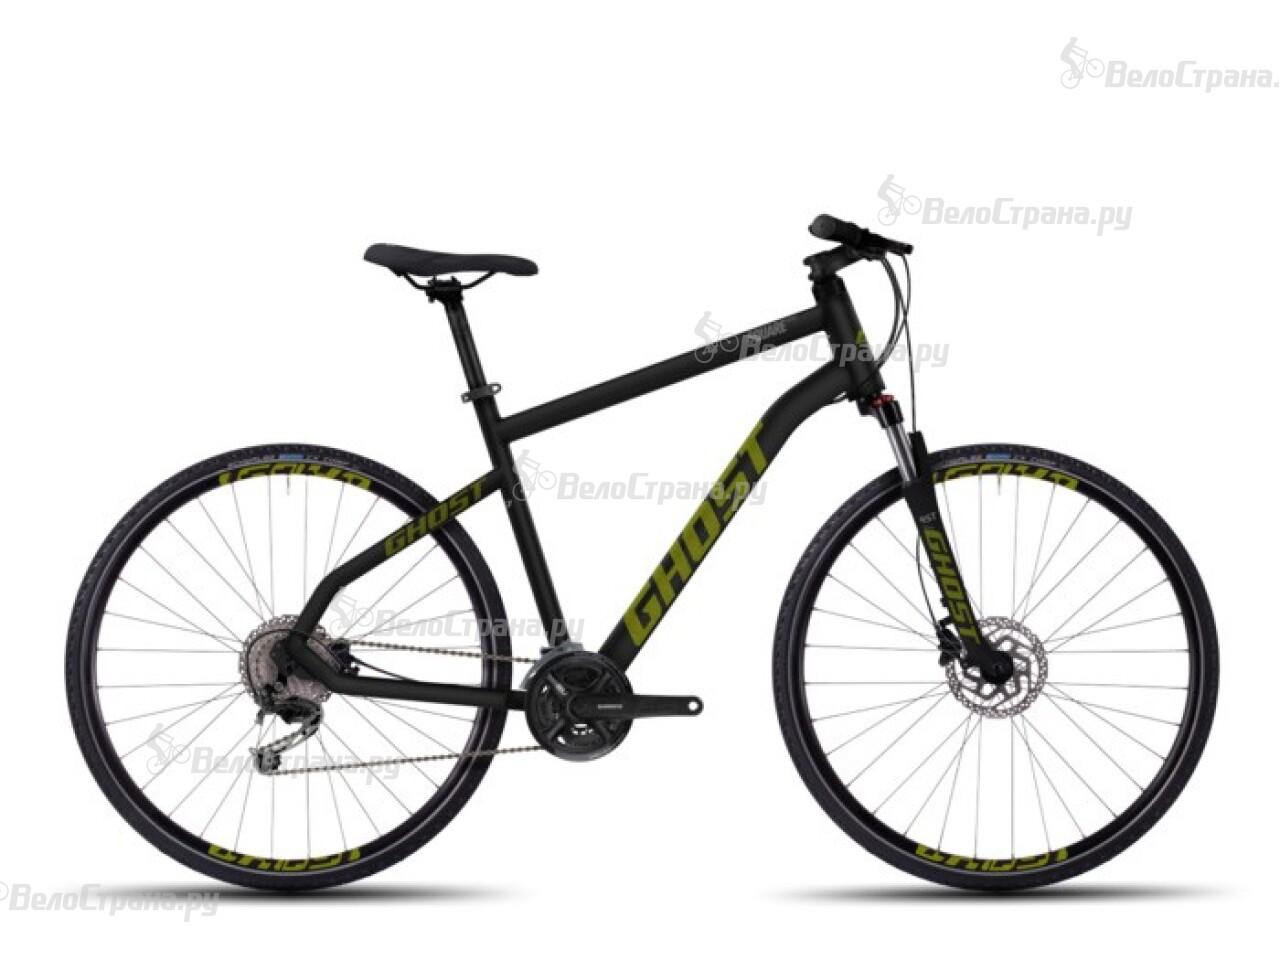 Велосипед Ghost SQUARE Cross 4 (2016) цены онлайн